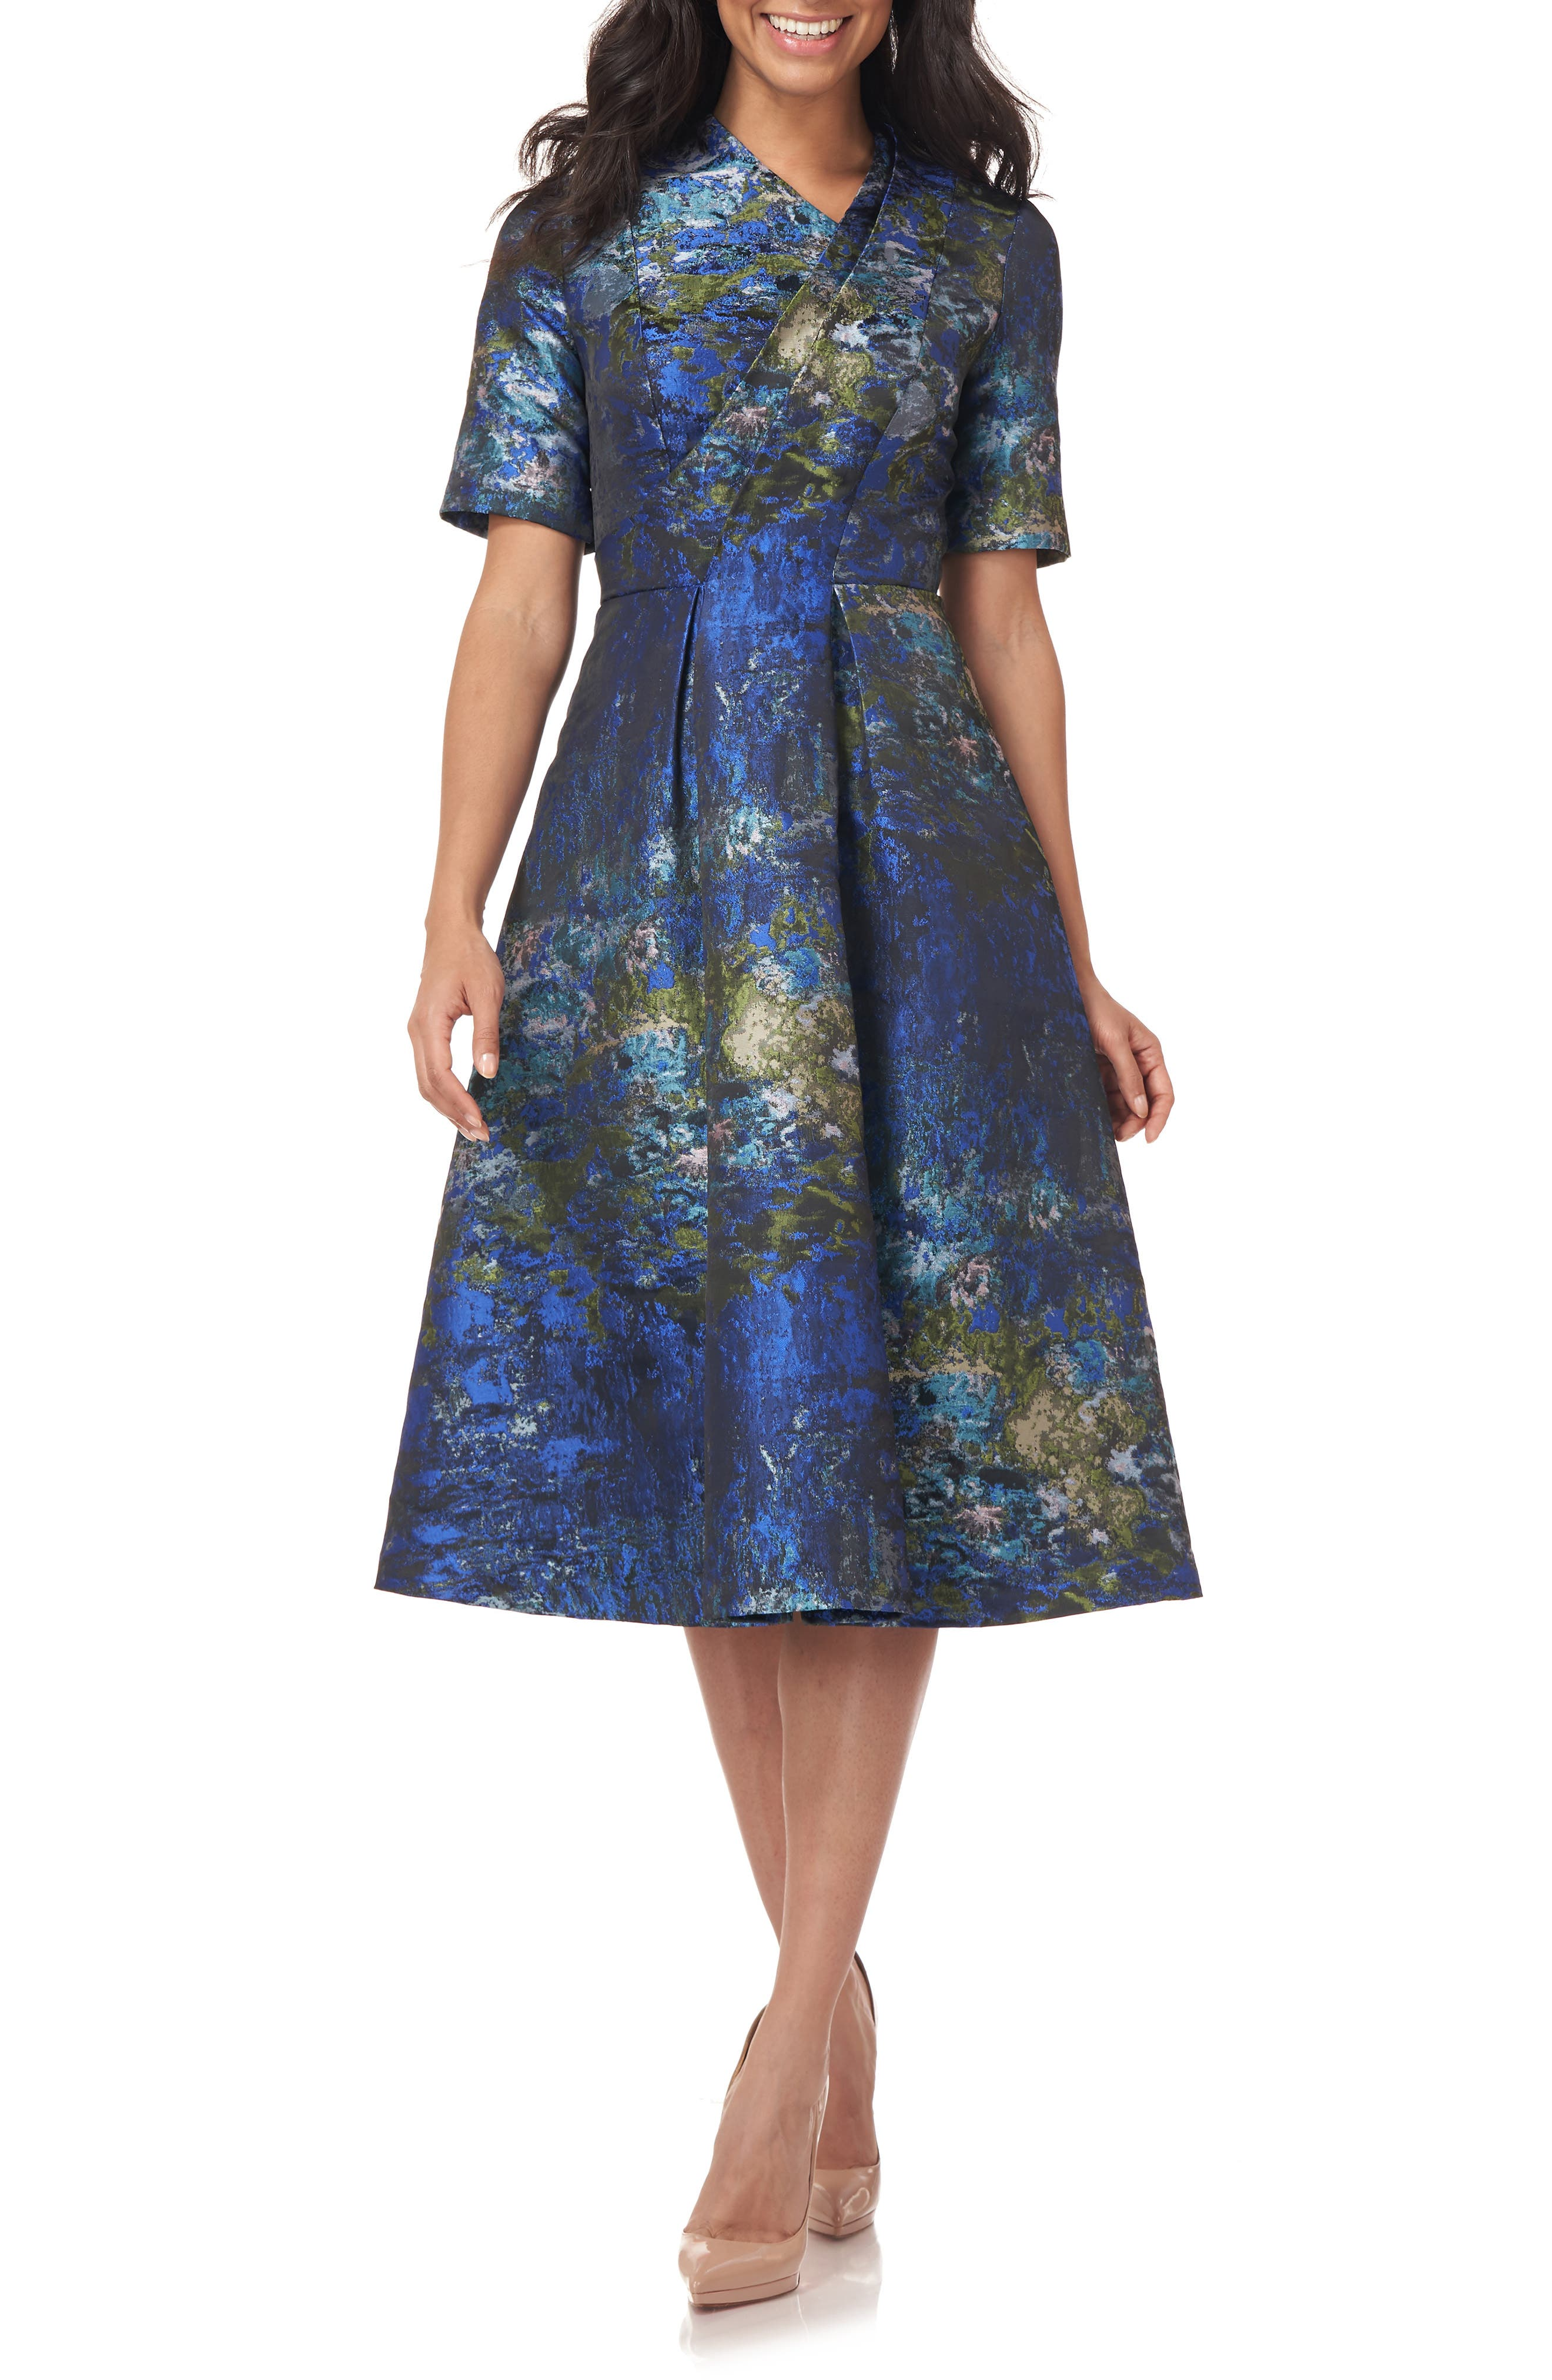 Tinsley Jacquard Midi Cocktail Dress